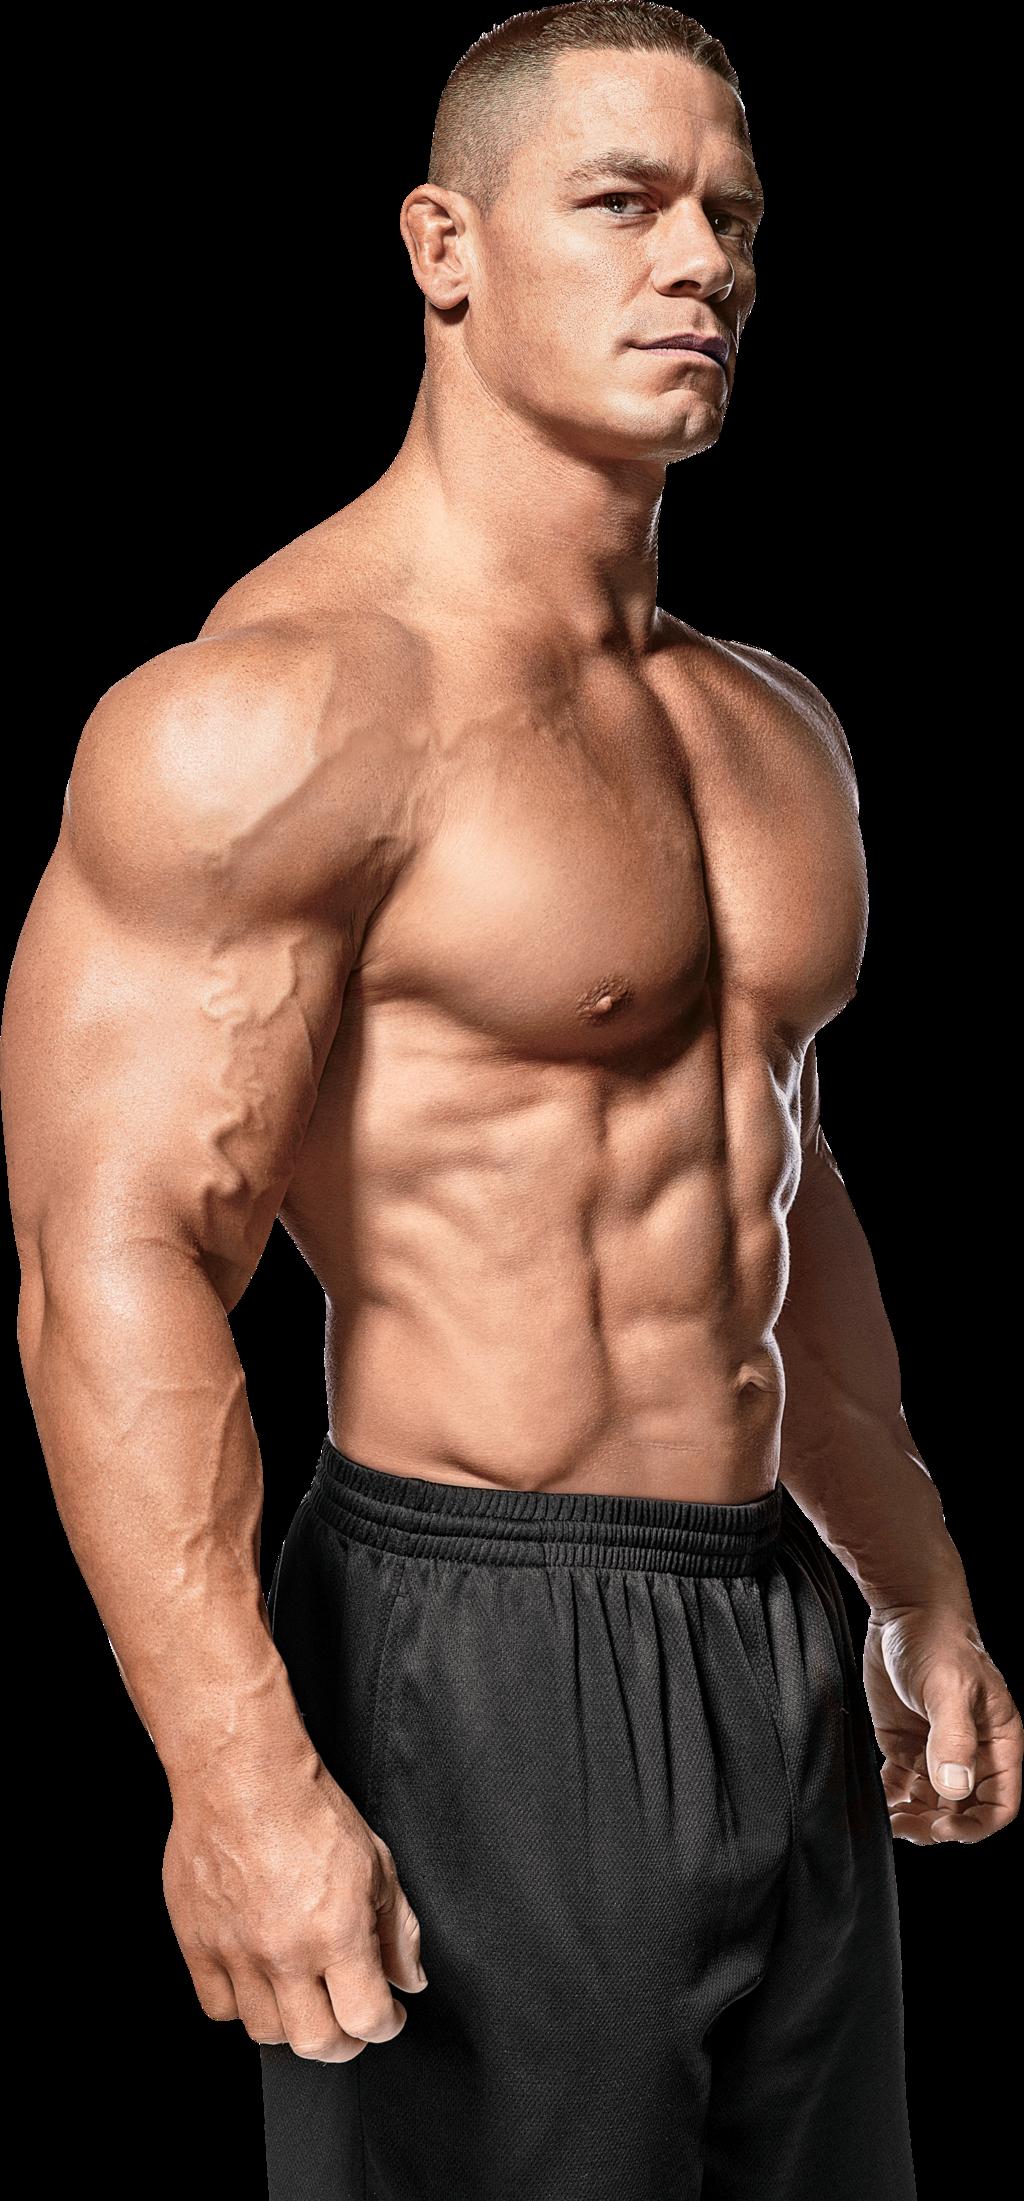 . PlusPng.com AmbriegnsAsylum16 John Cena Muscle and Fitness 2016 PNG by  AmbriegnsAsylum16 - John Cena PNG